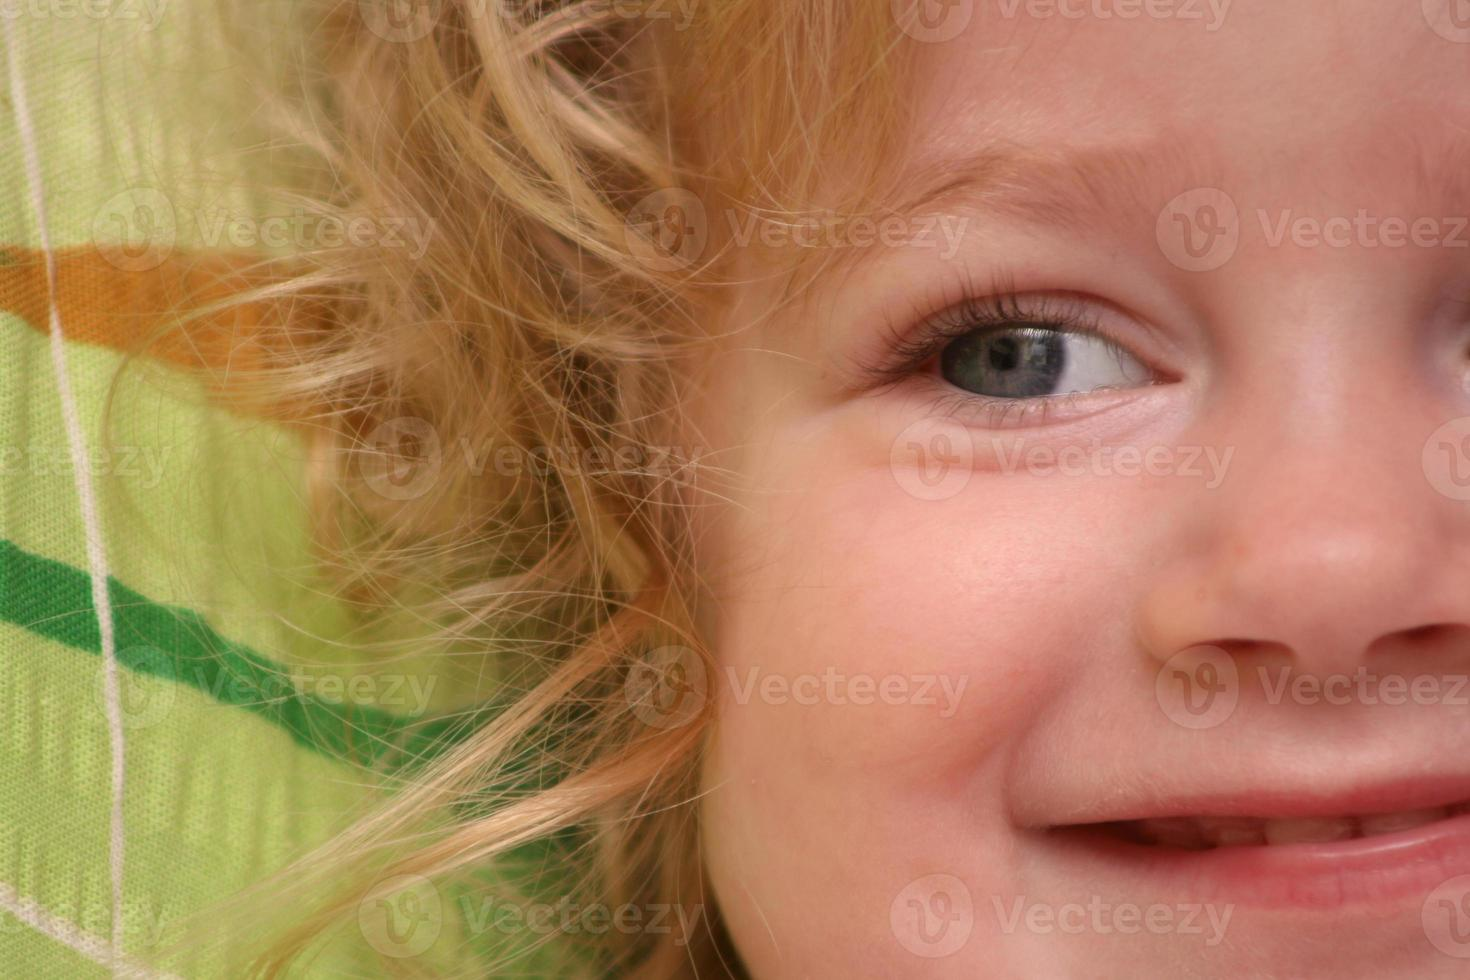 Girl close-up photo